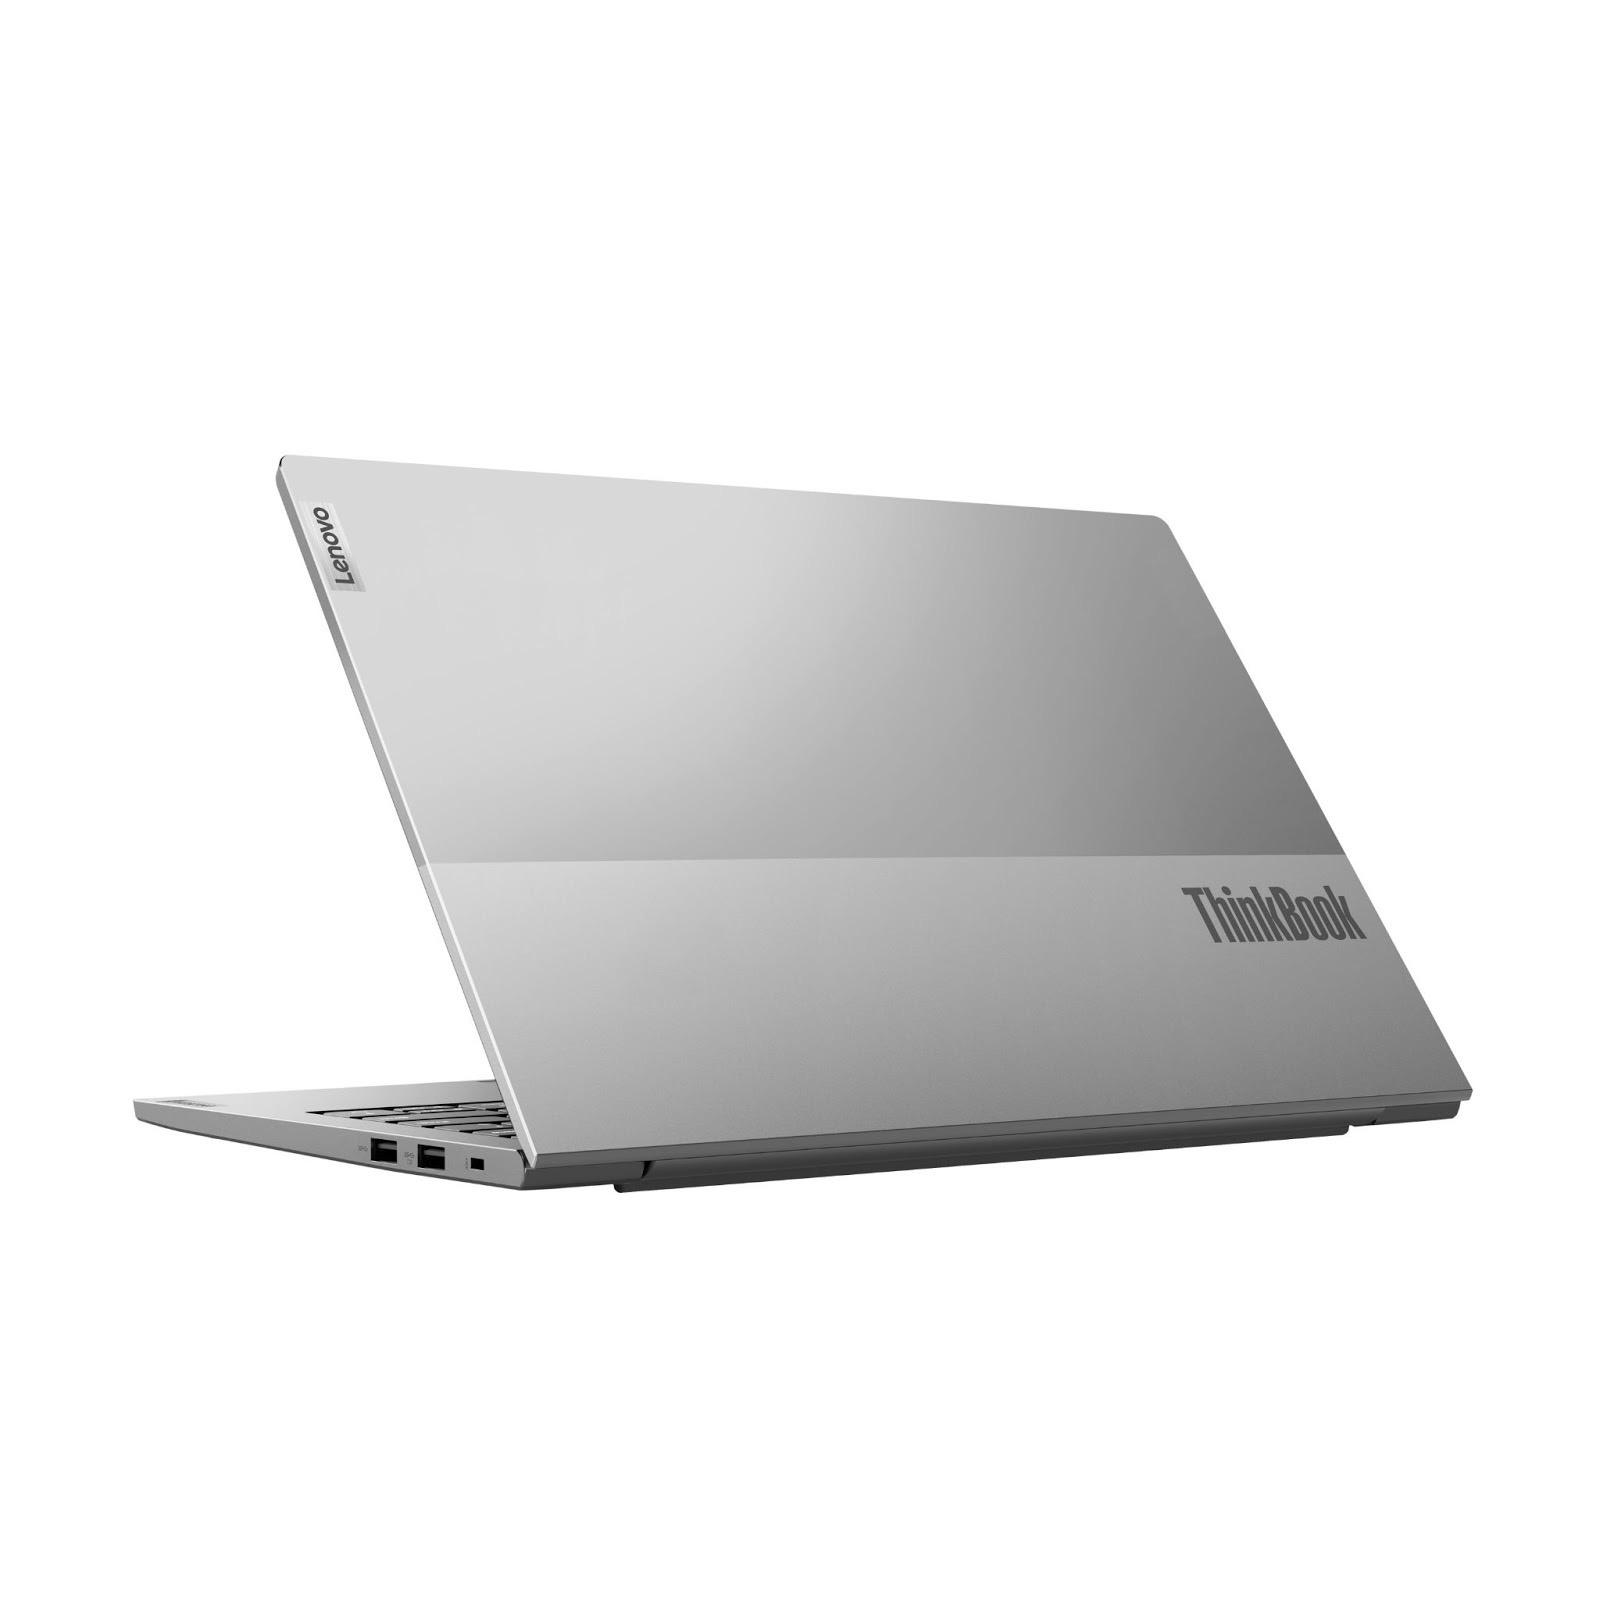 Фото 1. Ноутбук Lenovo ThinkBook 13s Gen 2 ITL (20V9003URU)